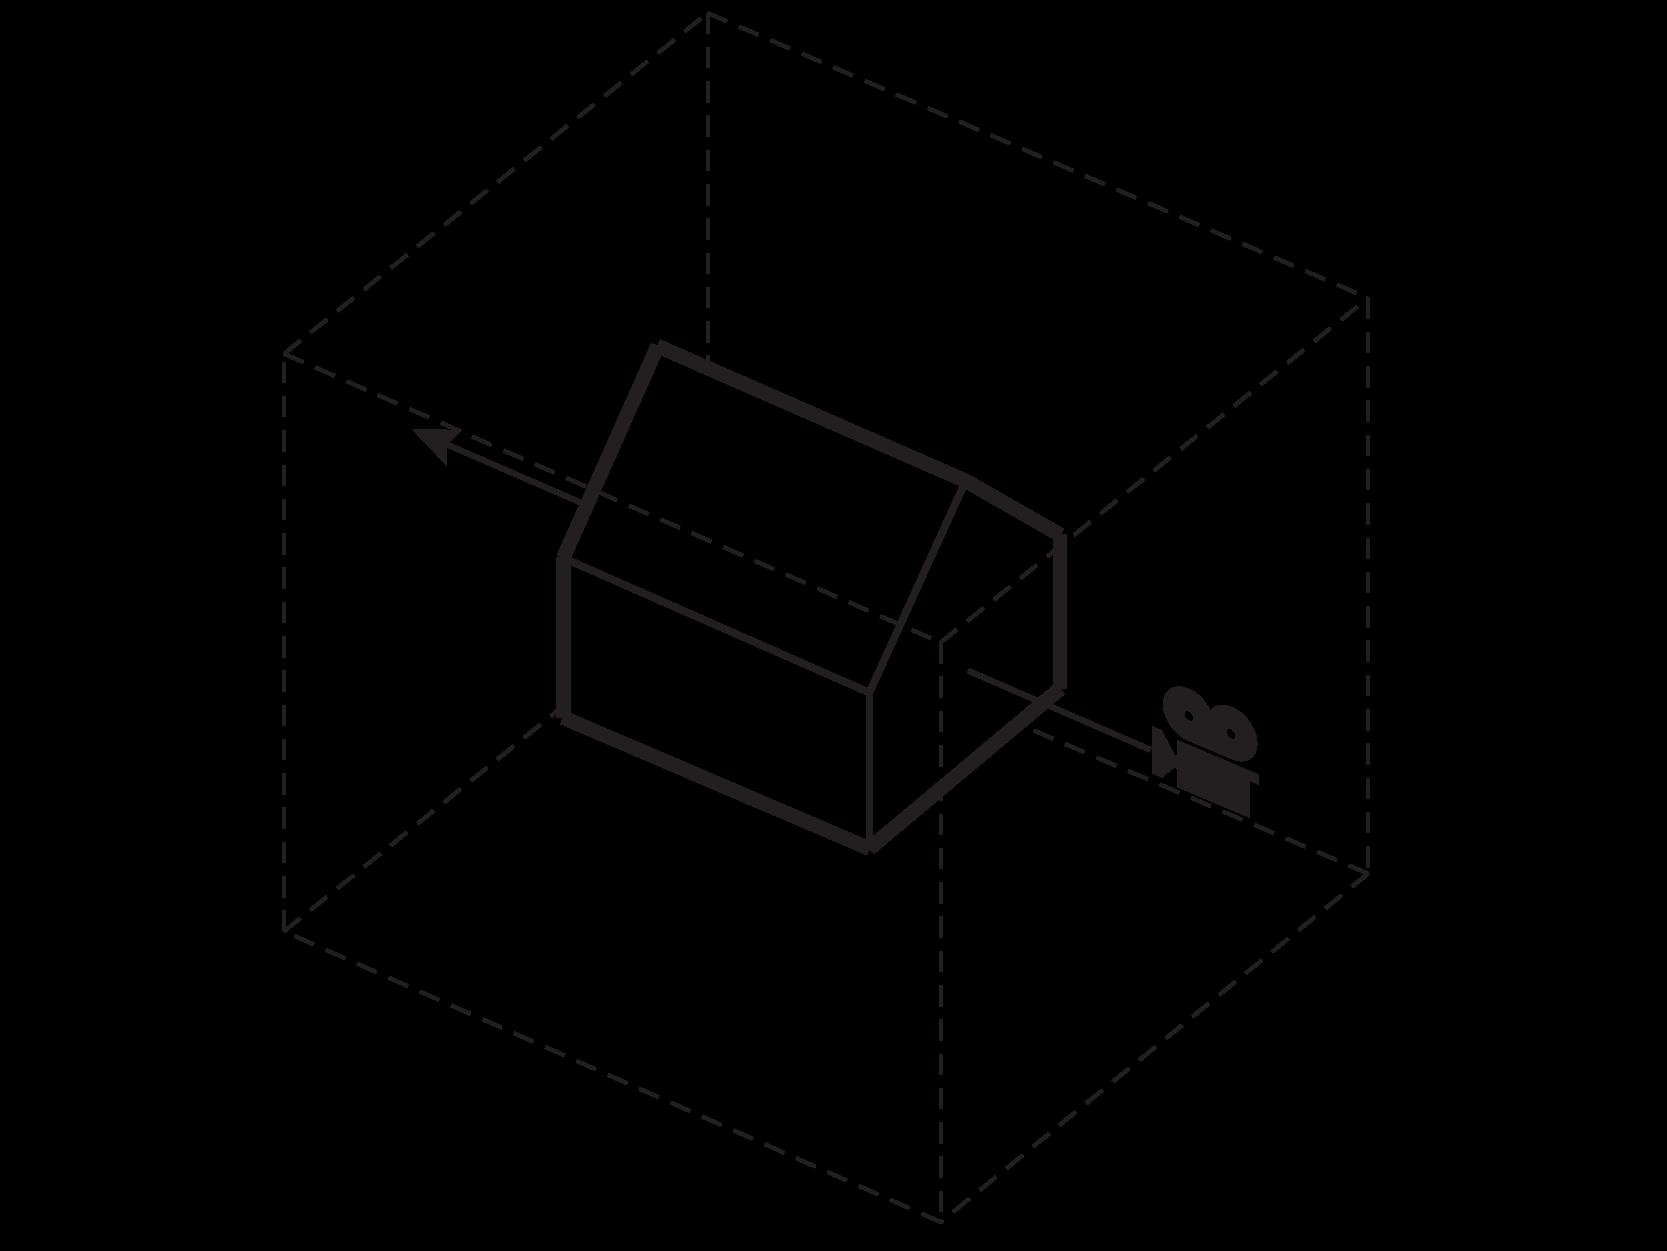 '2d' View (Orthagonal)